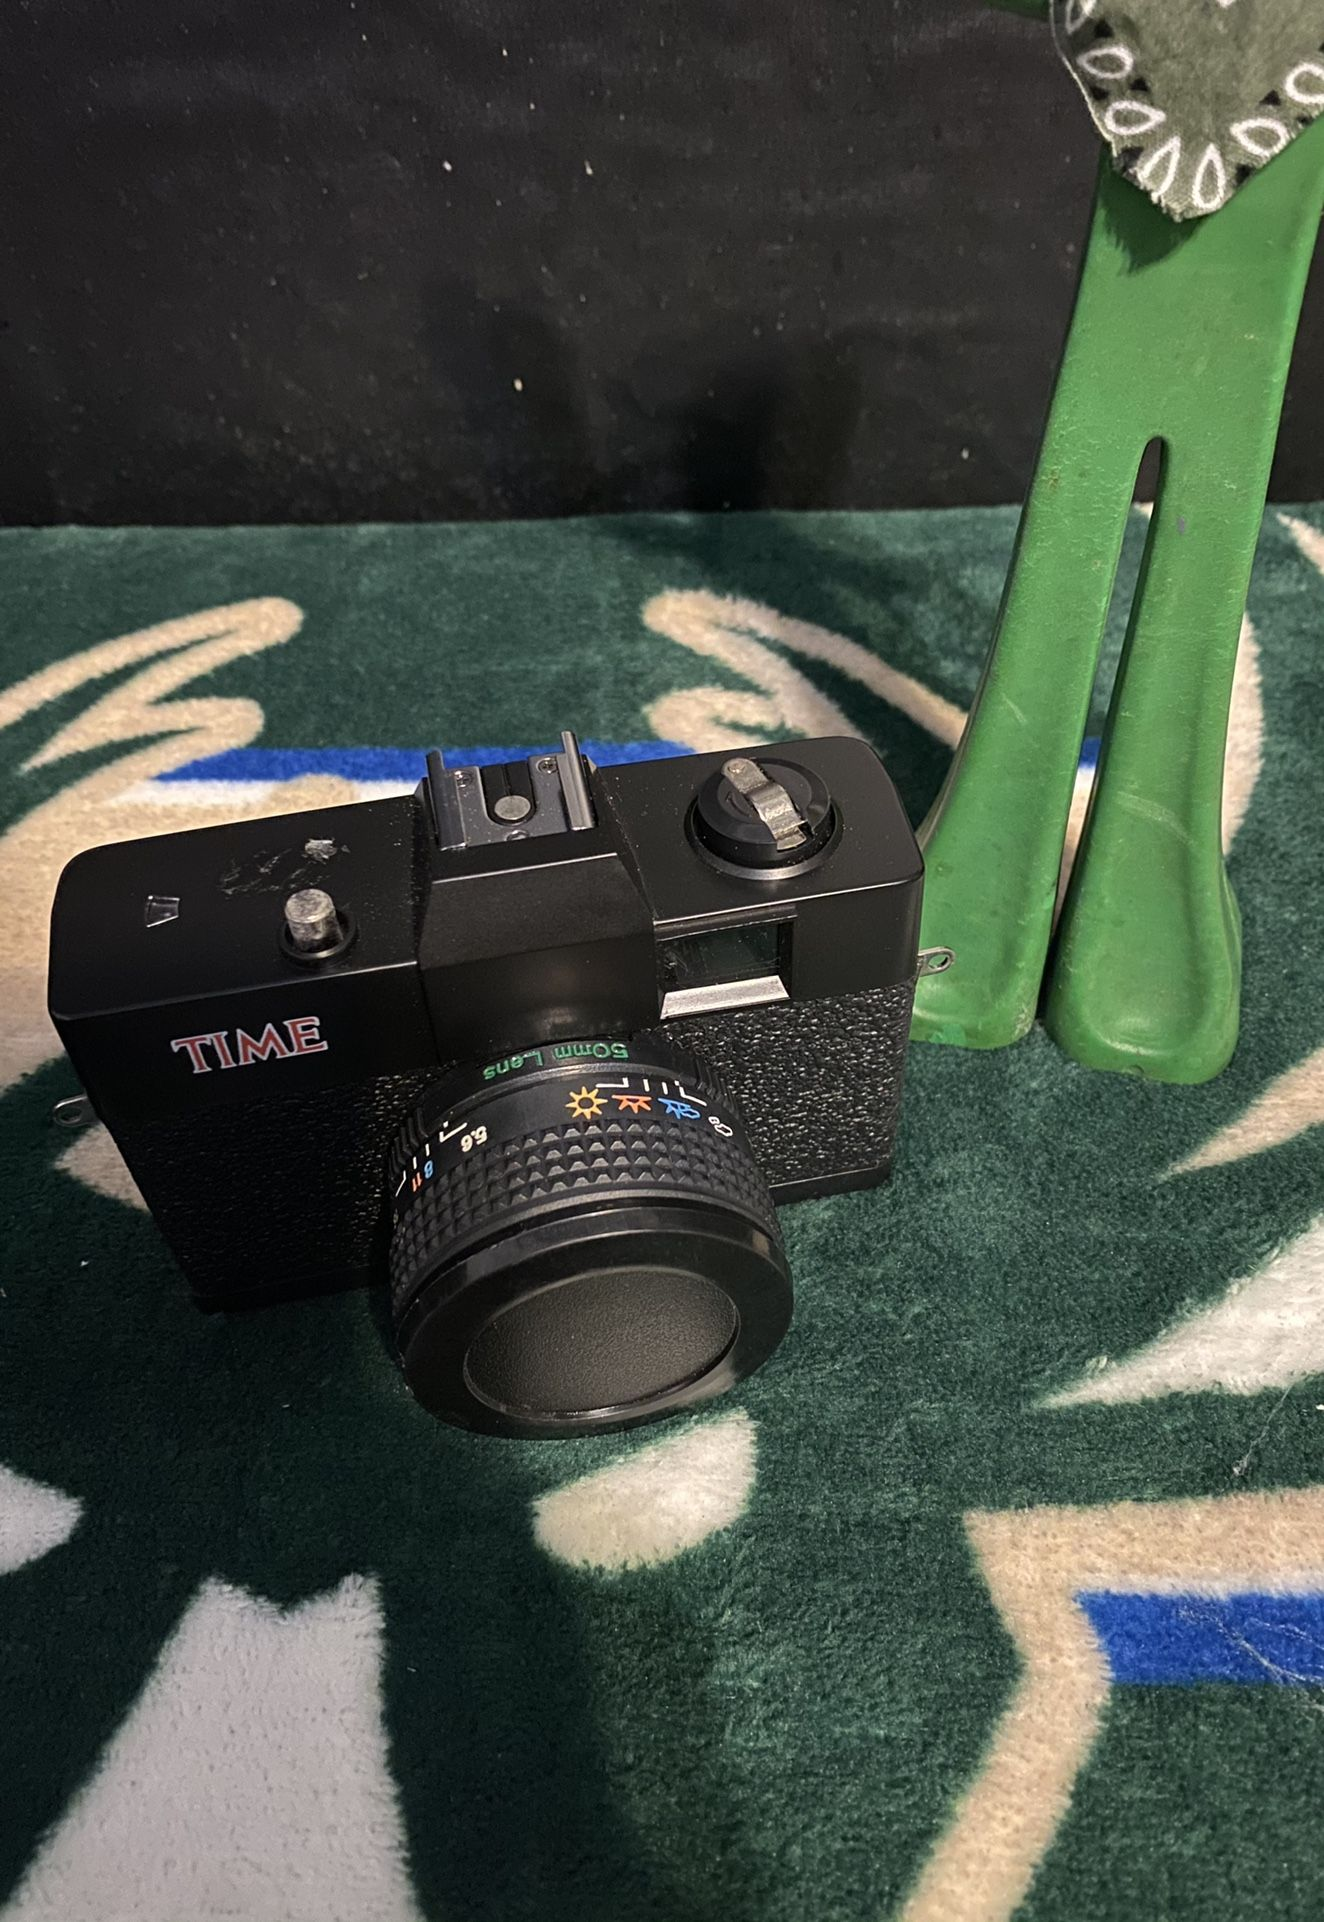 TIME 35mm Film Camera.